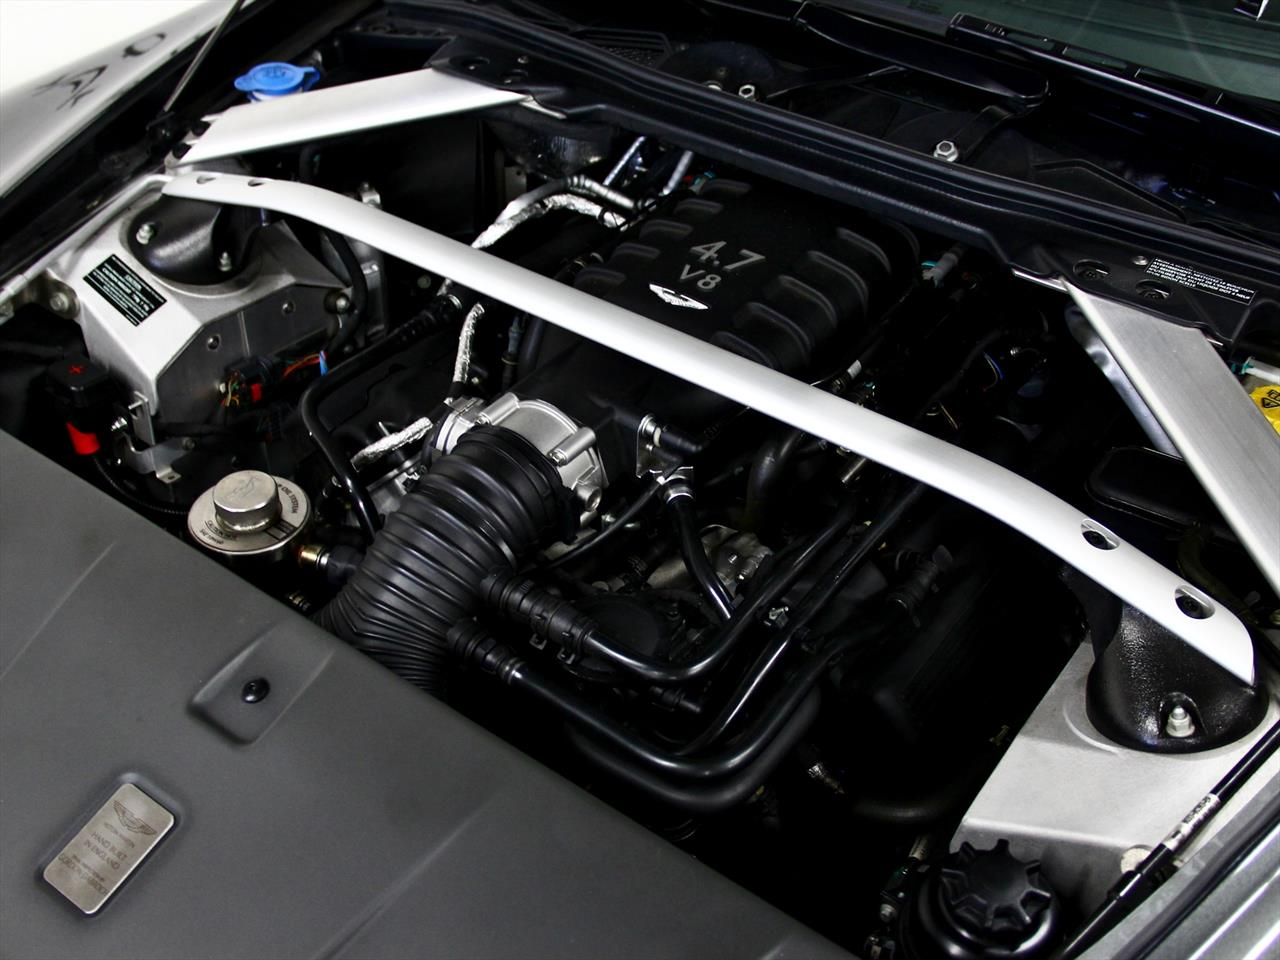 1999 jaguar xk series tilt steering lever repair 1999 for 2000 jaguar s type window regulator replacement